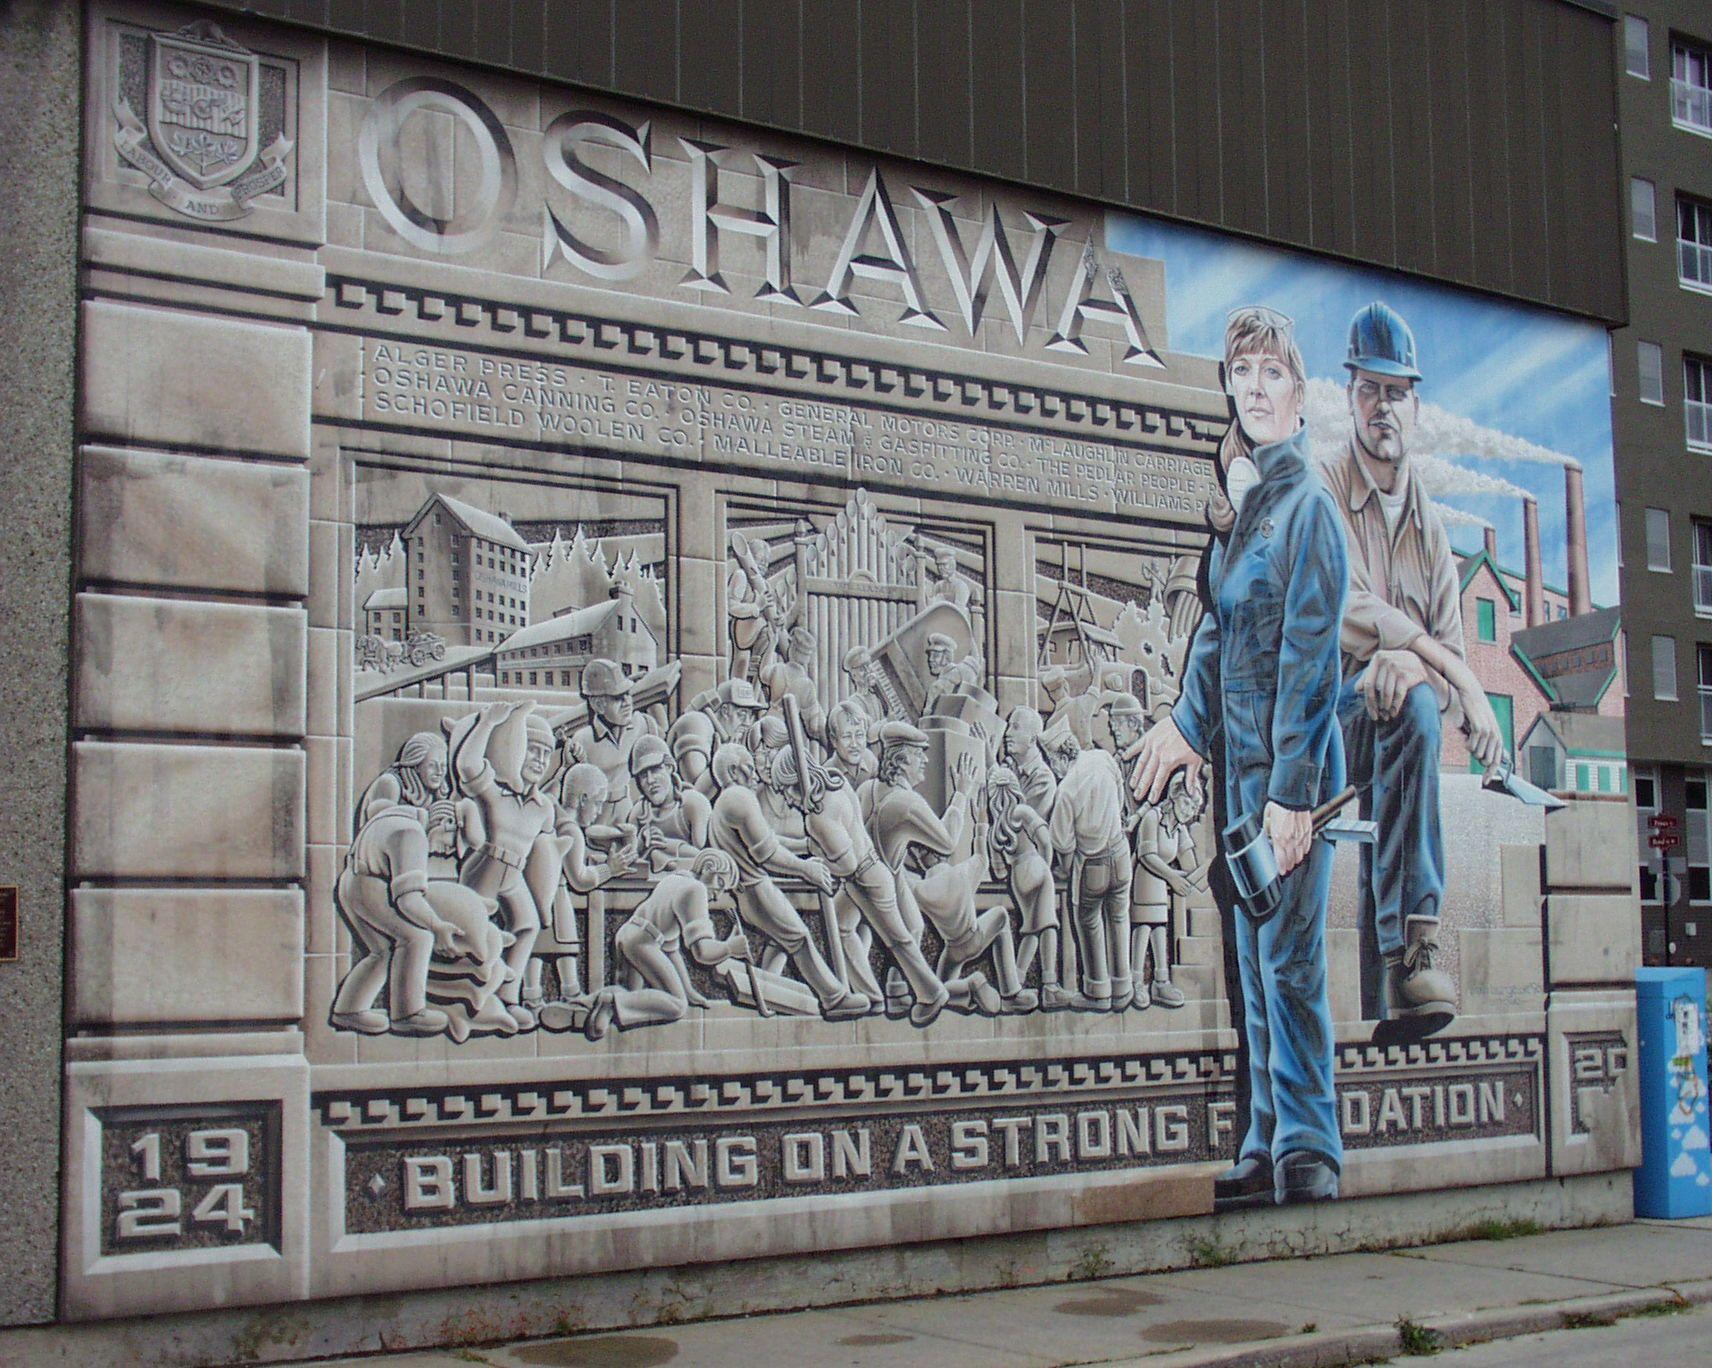 windfields farm wall mural in oshawa ontario murals graffiti wall mural in oshawa ontario